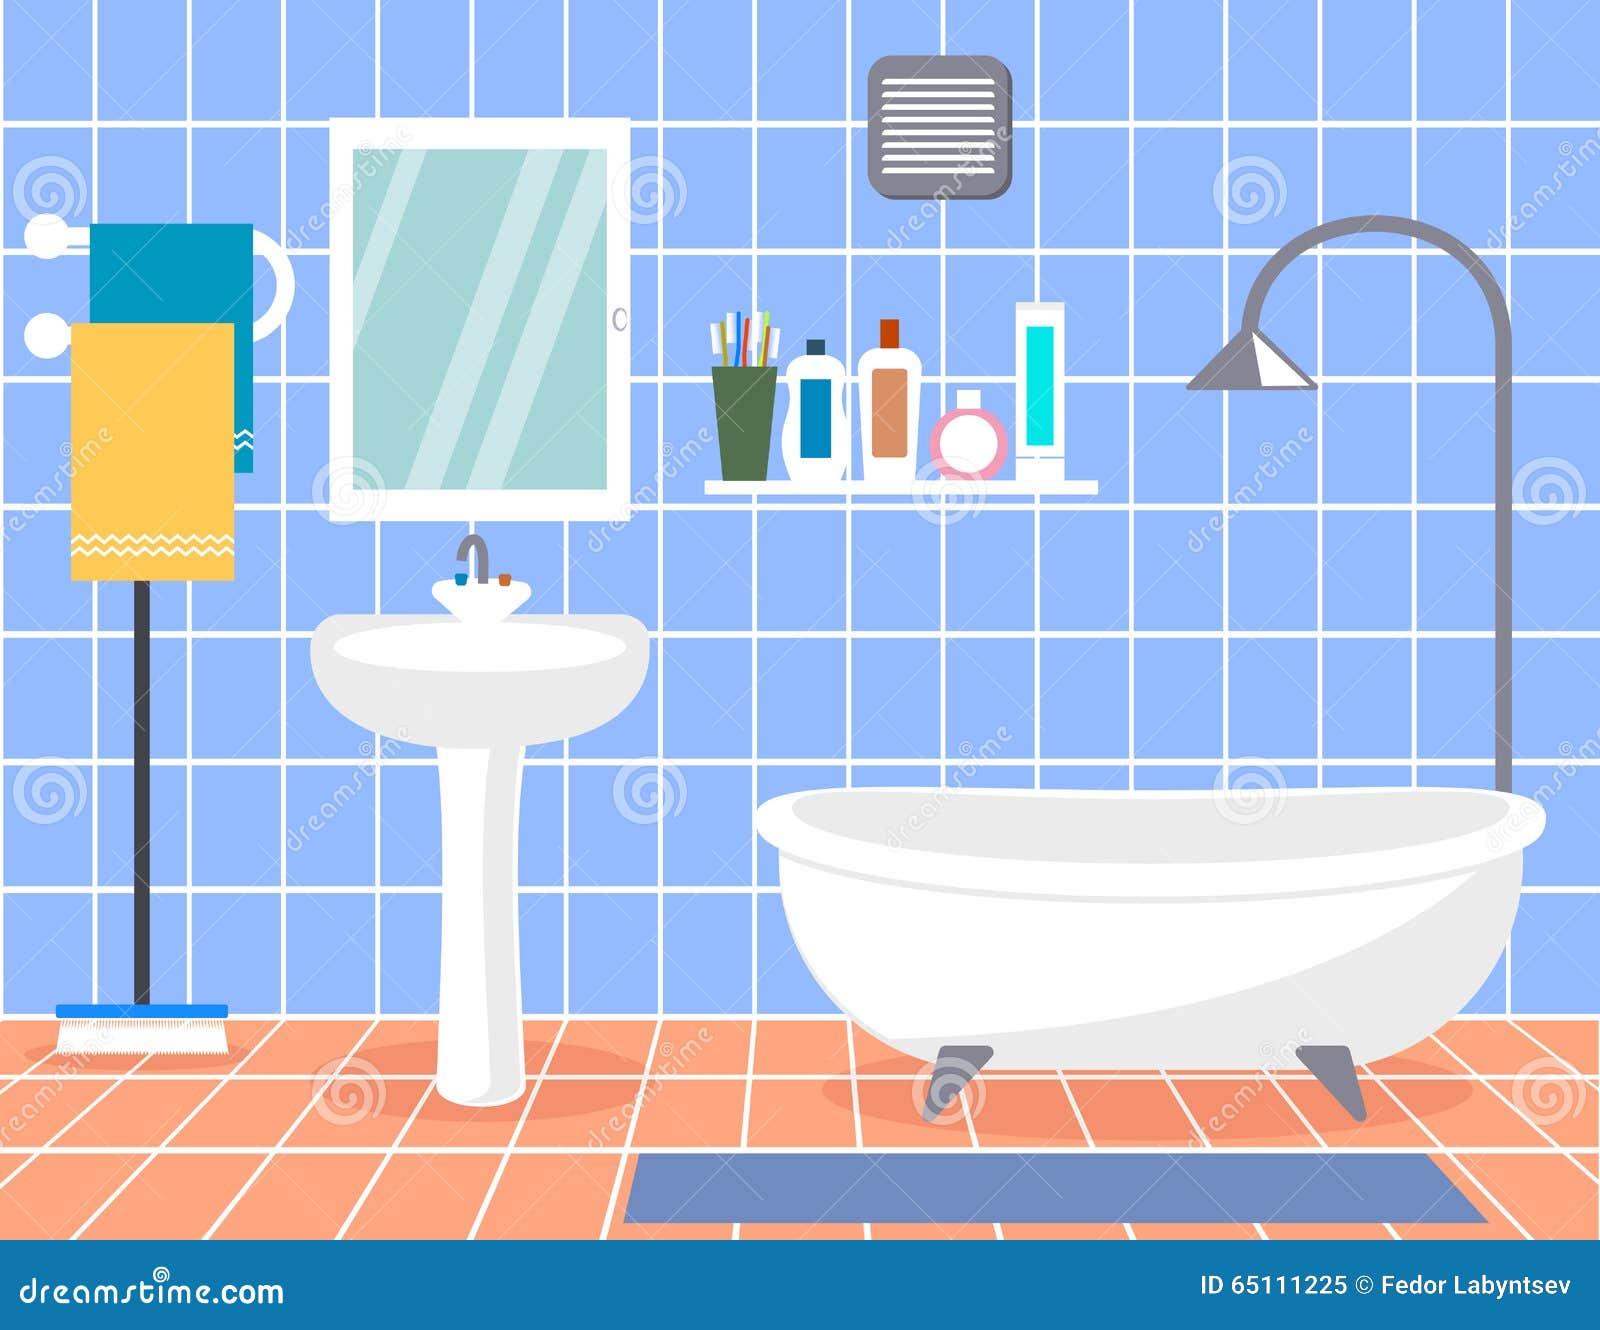 Design Modern Bathroom. Bathroom Interior With In Flat ...